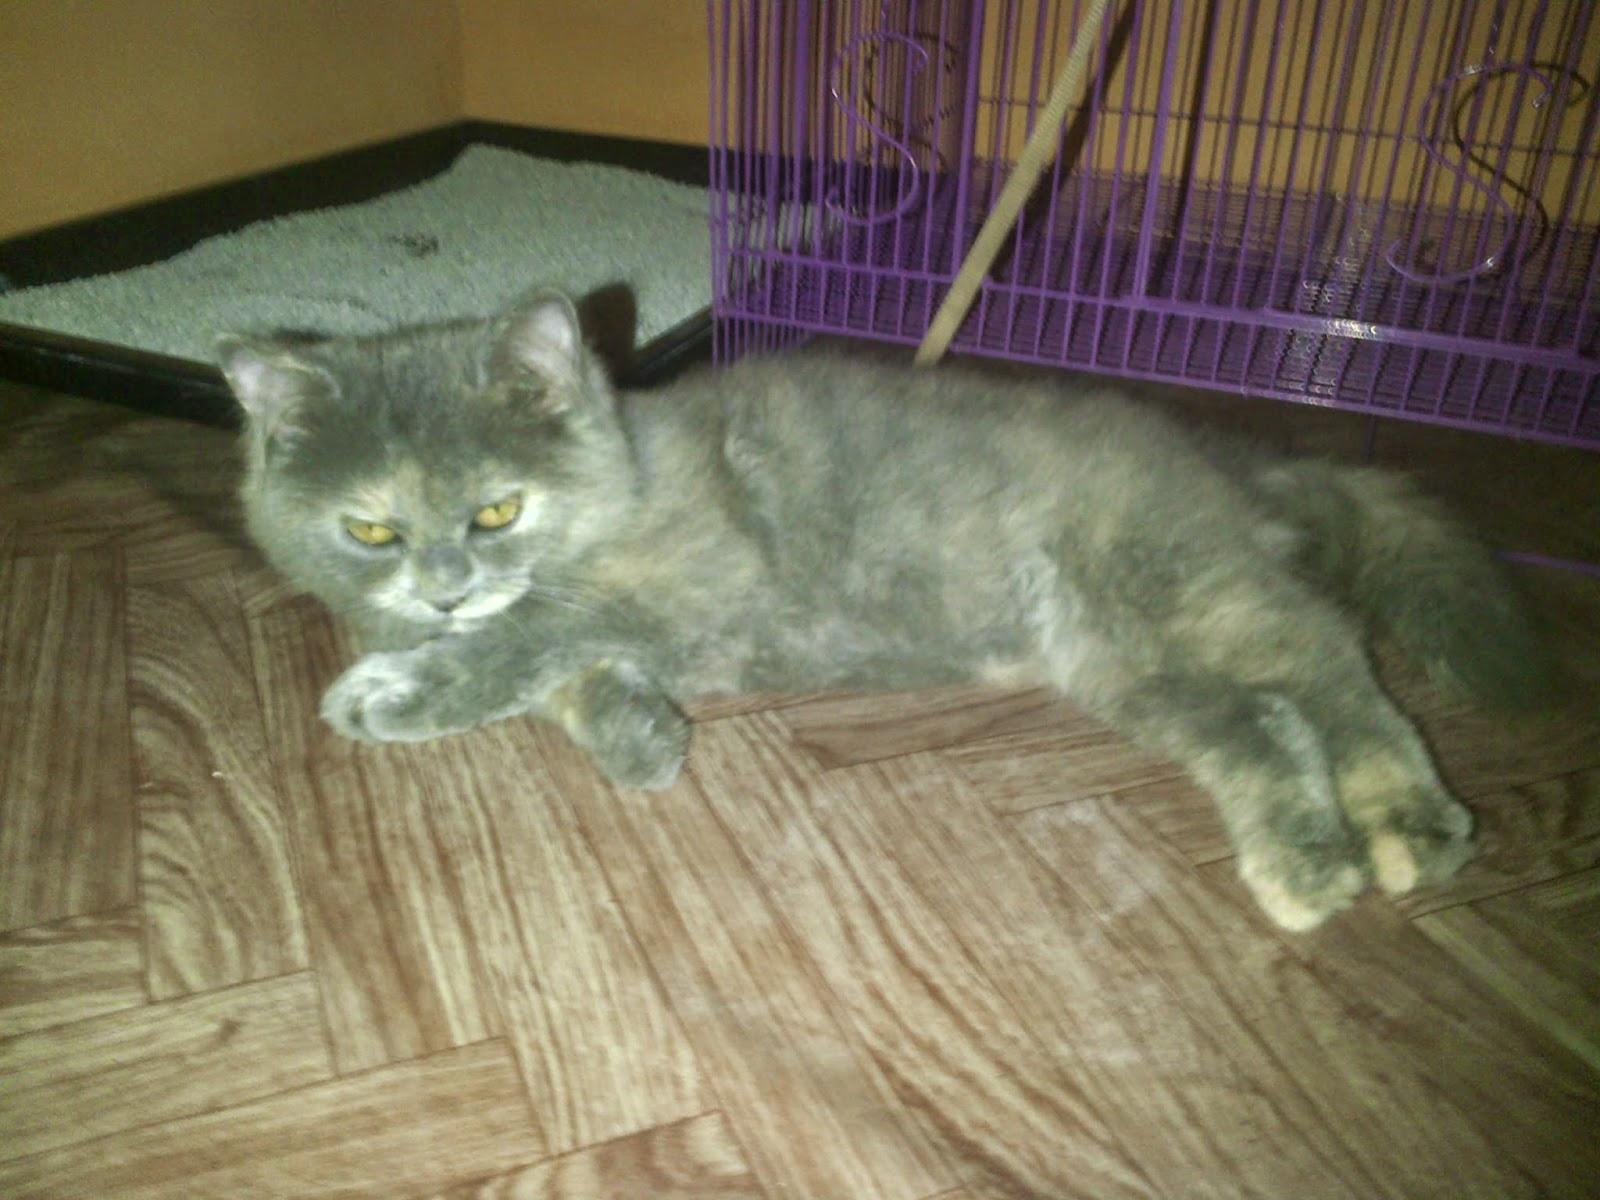 Perawatan Kucing Persia Medium Jual Beli Kucing Dan